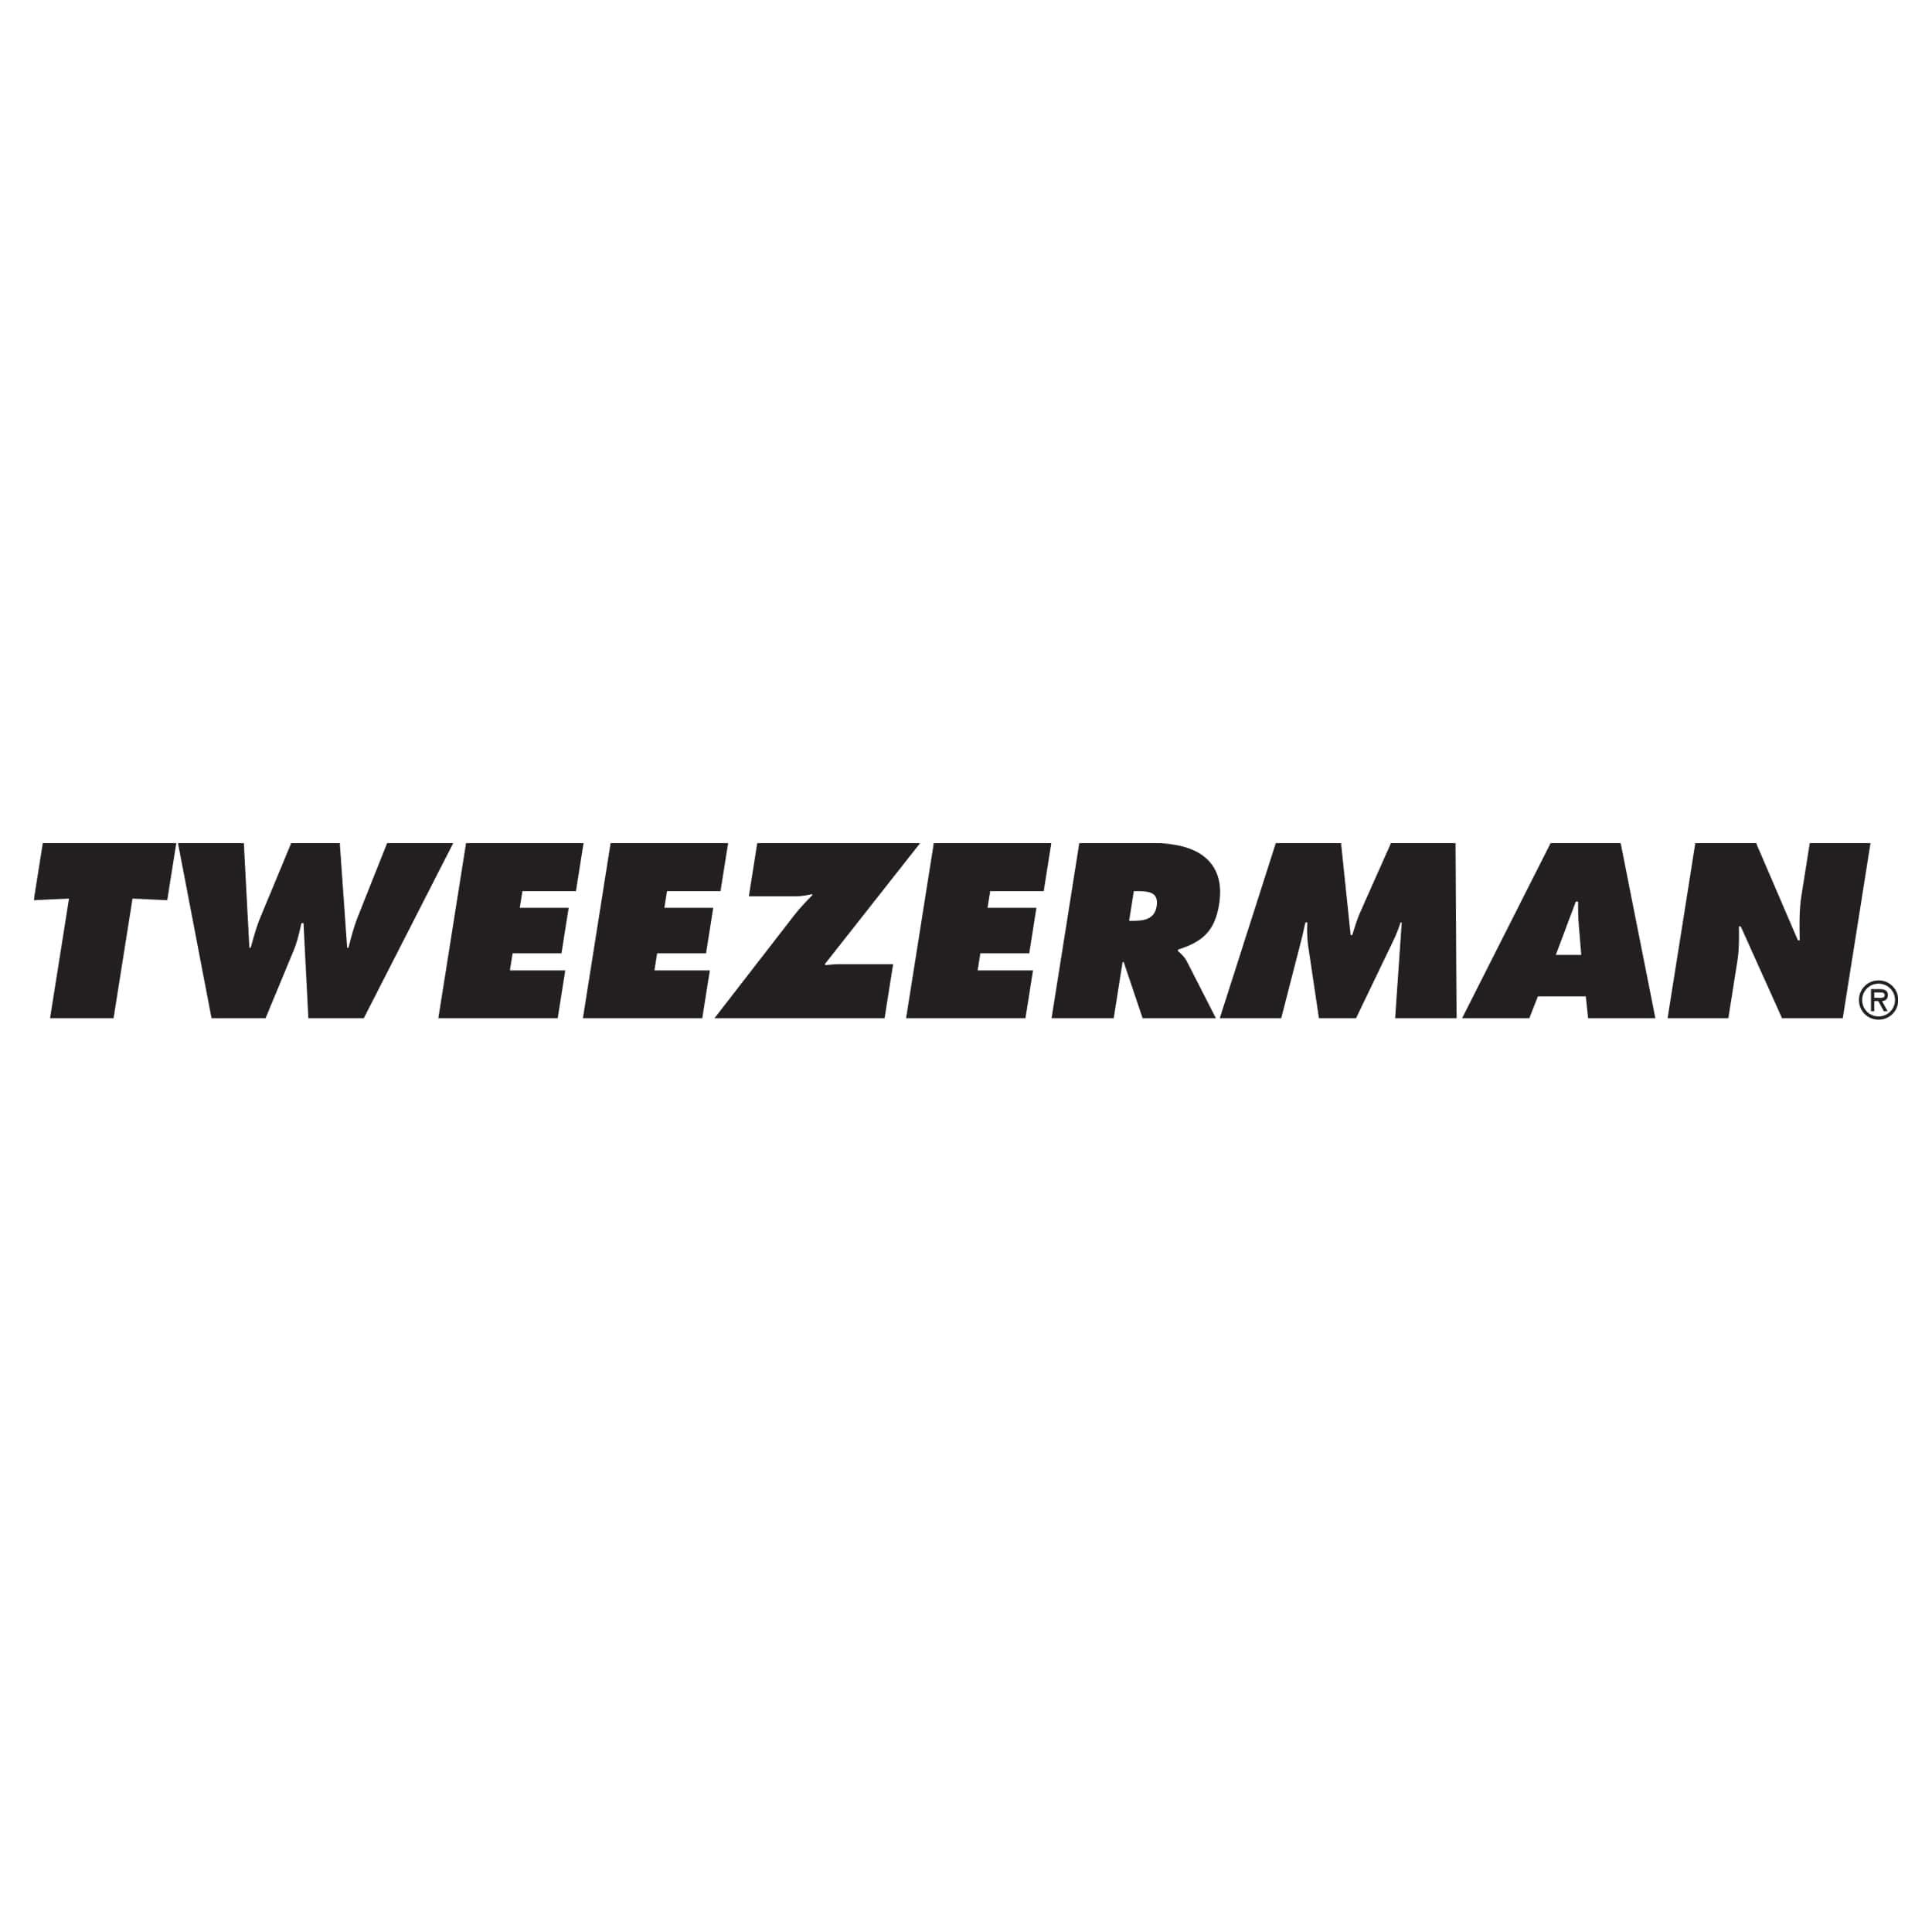 tweezerman eyelash curler. tweezerman eyelash curler r